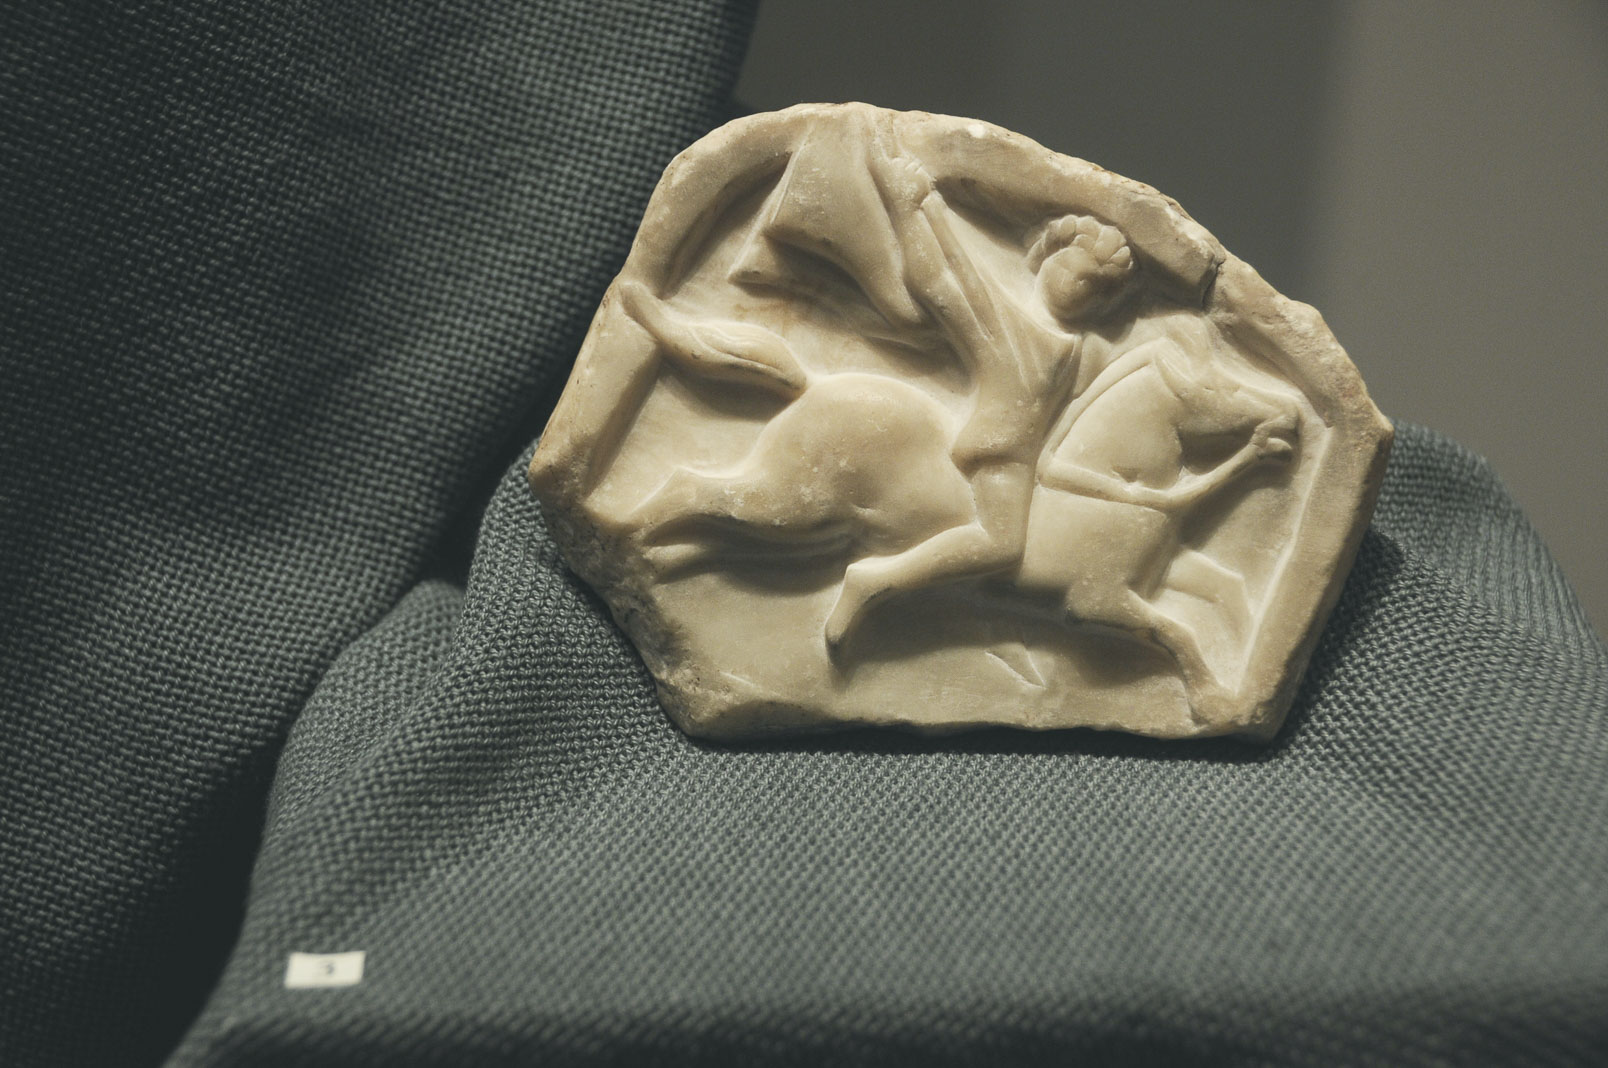 troyan-museum-jivotat-na-edna-idea-4